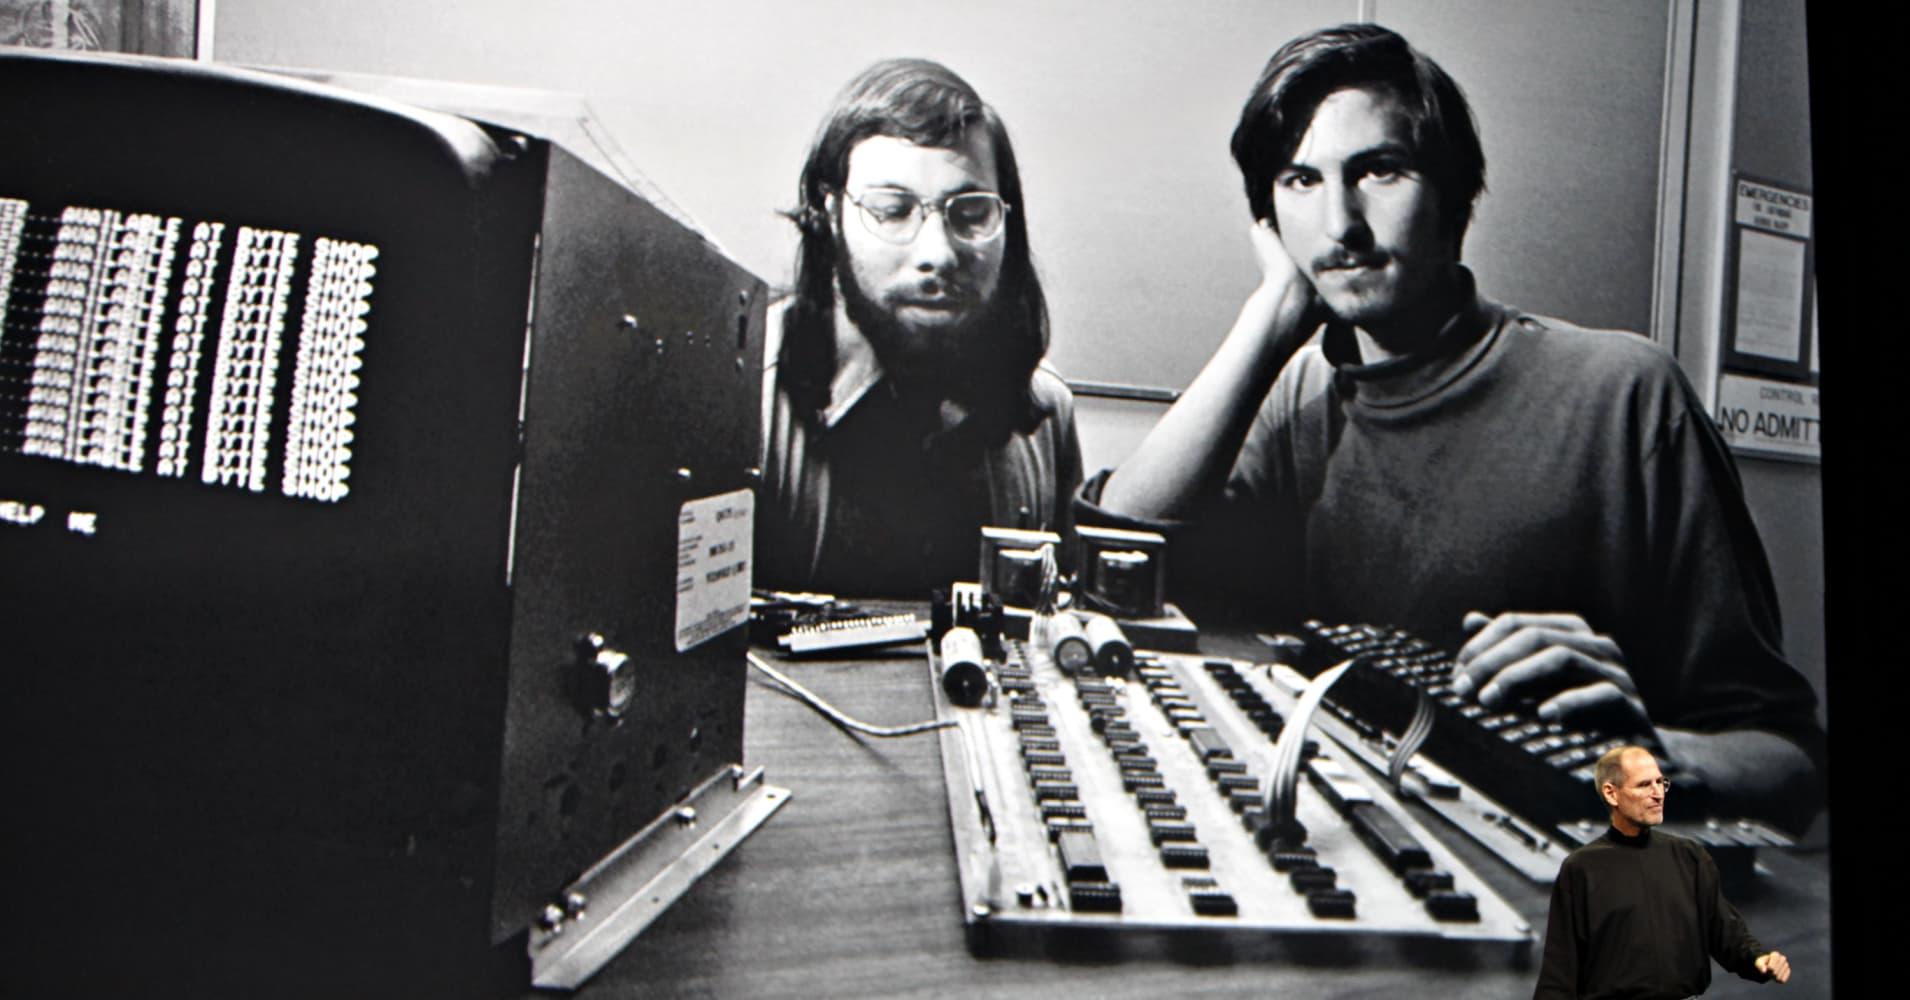 Bill Fernandez, Apple's first employee, knew Steve Jobs (right) and Steve Wozniak (left) since childhood.